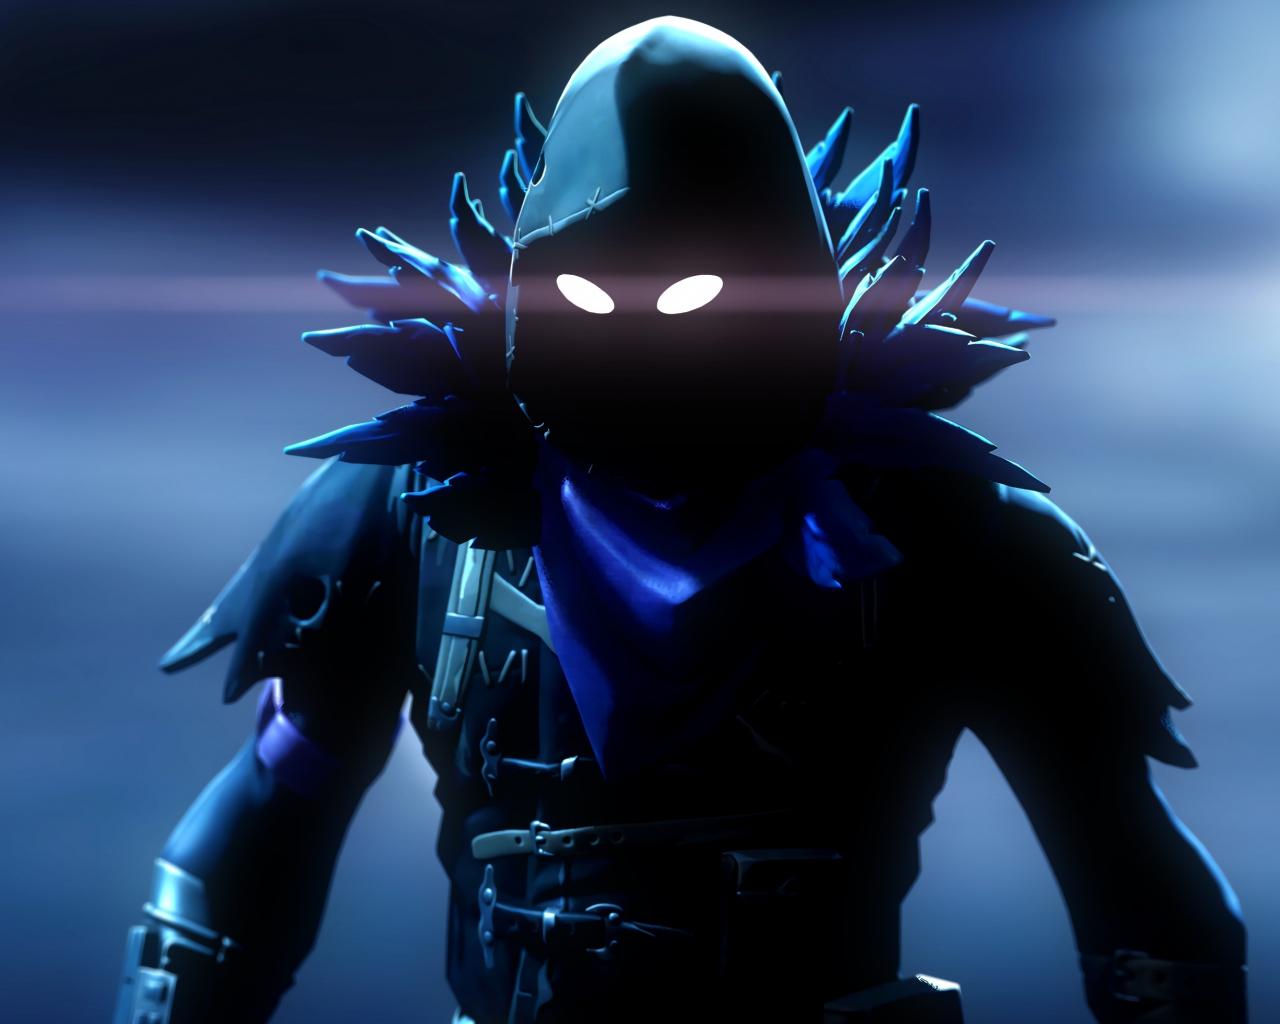 Raven, Video Game, Fortnite, Dark, 1280x1024 Wallpaper